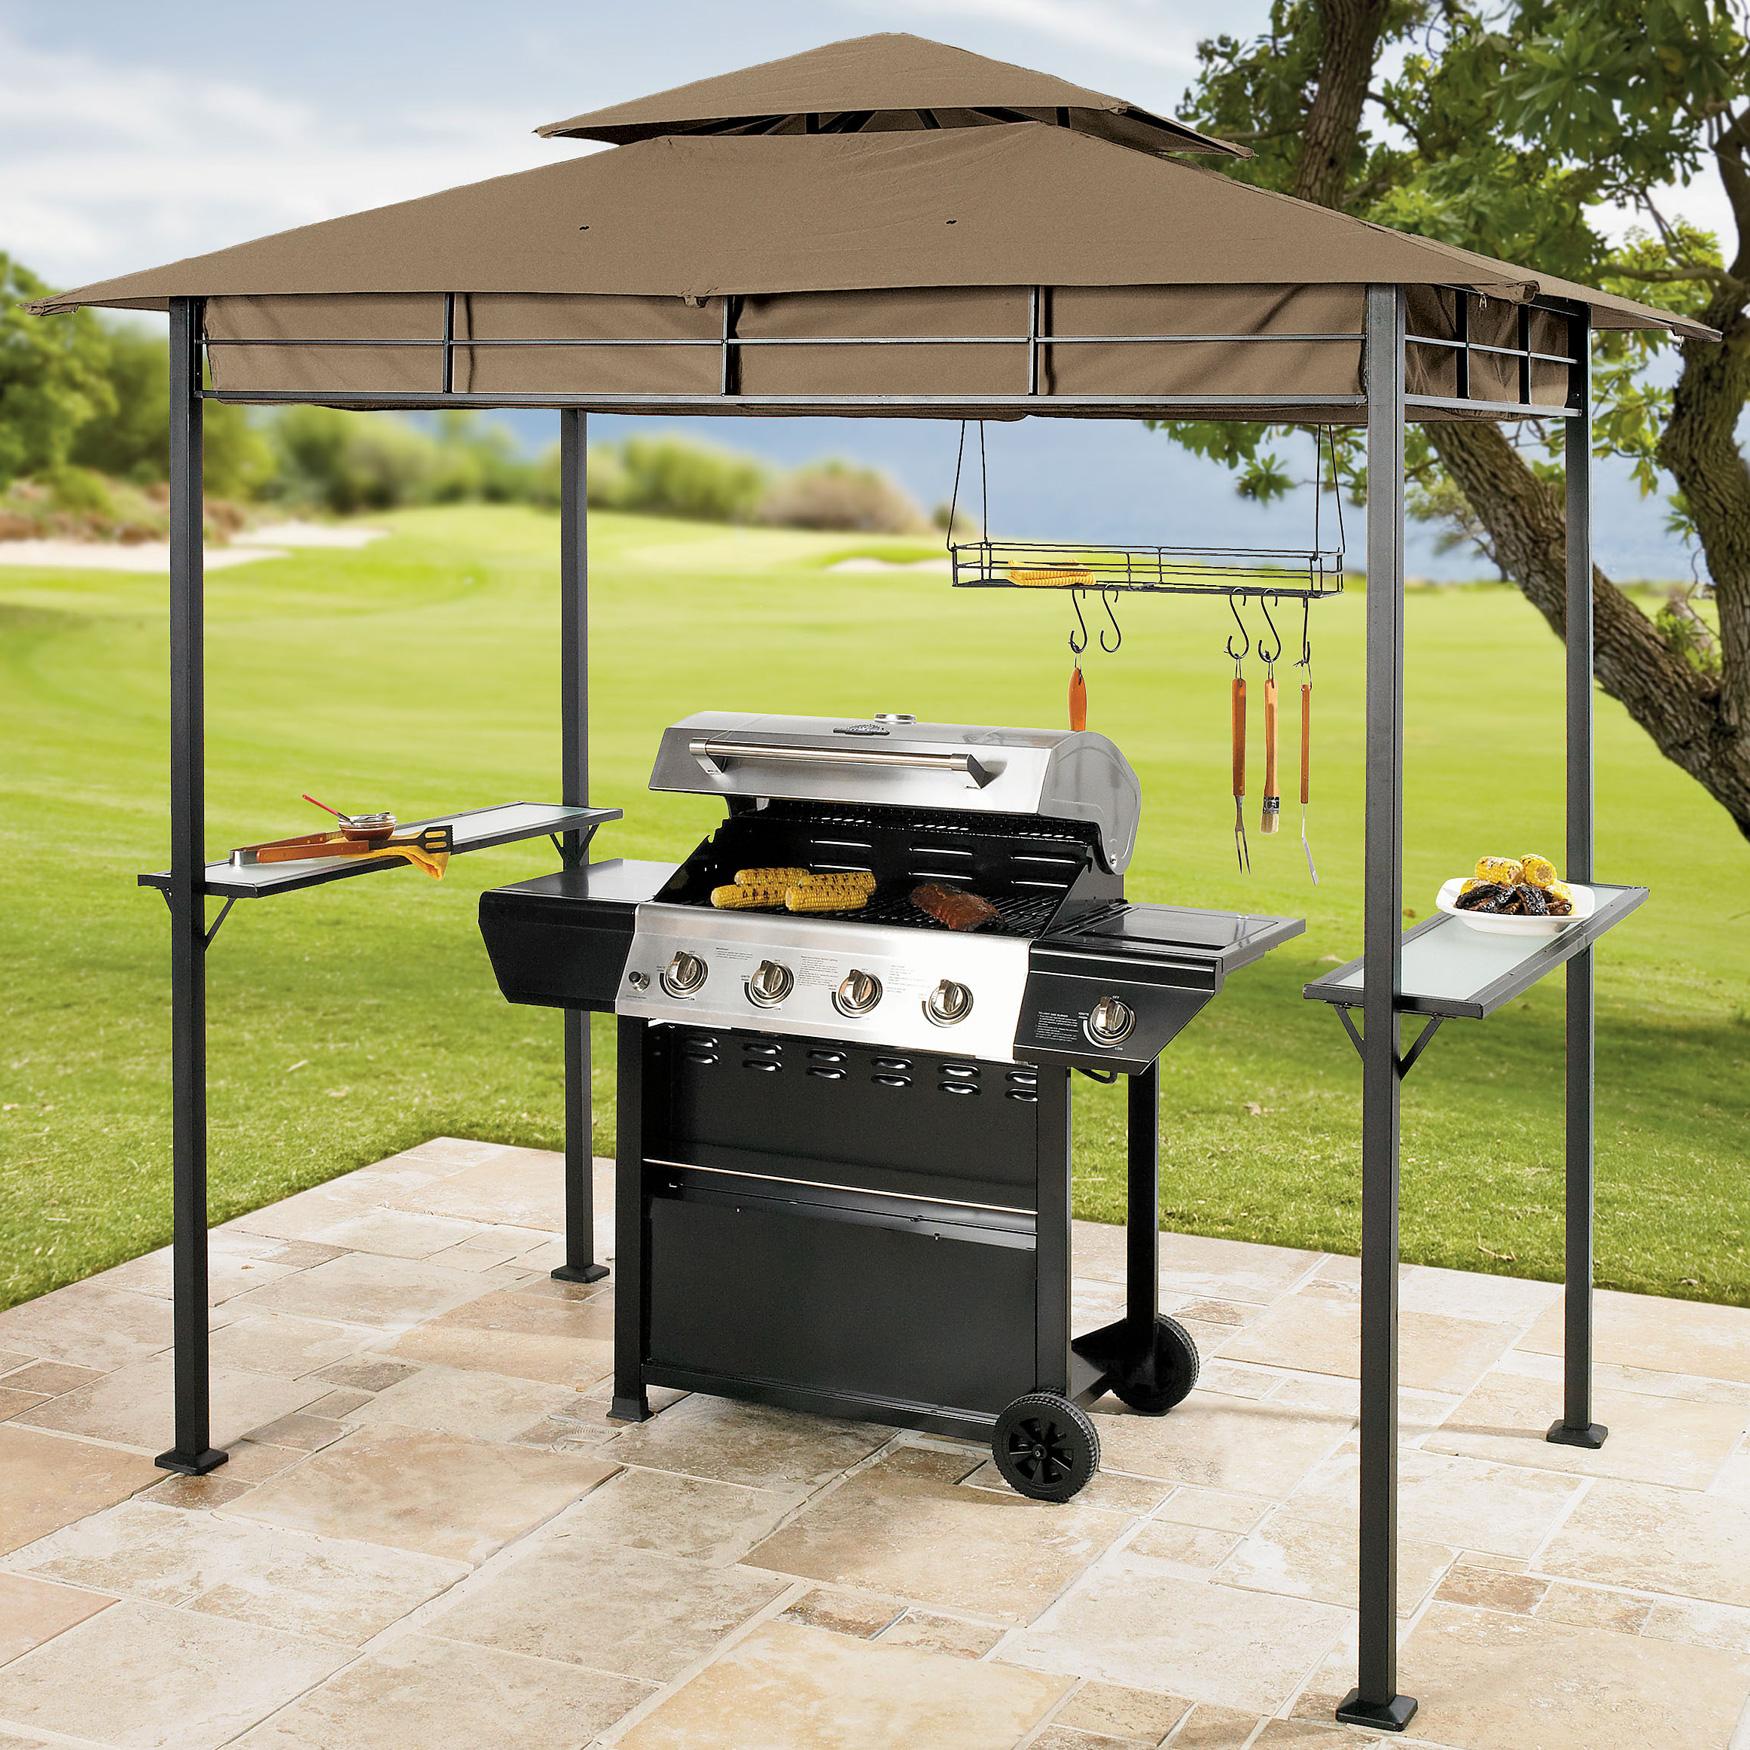 grill gazebo 1588_58034_mm PFYNBUO